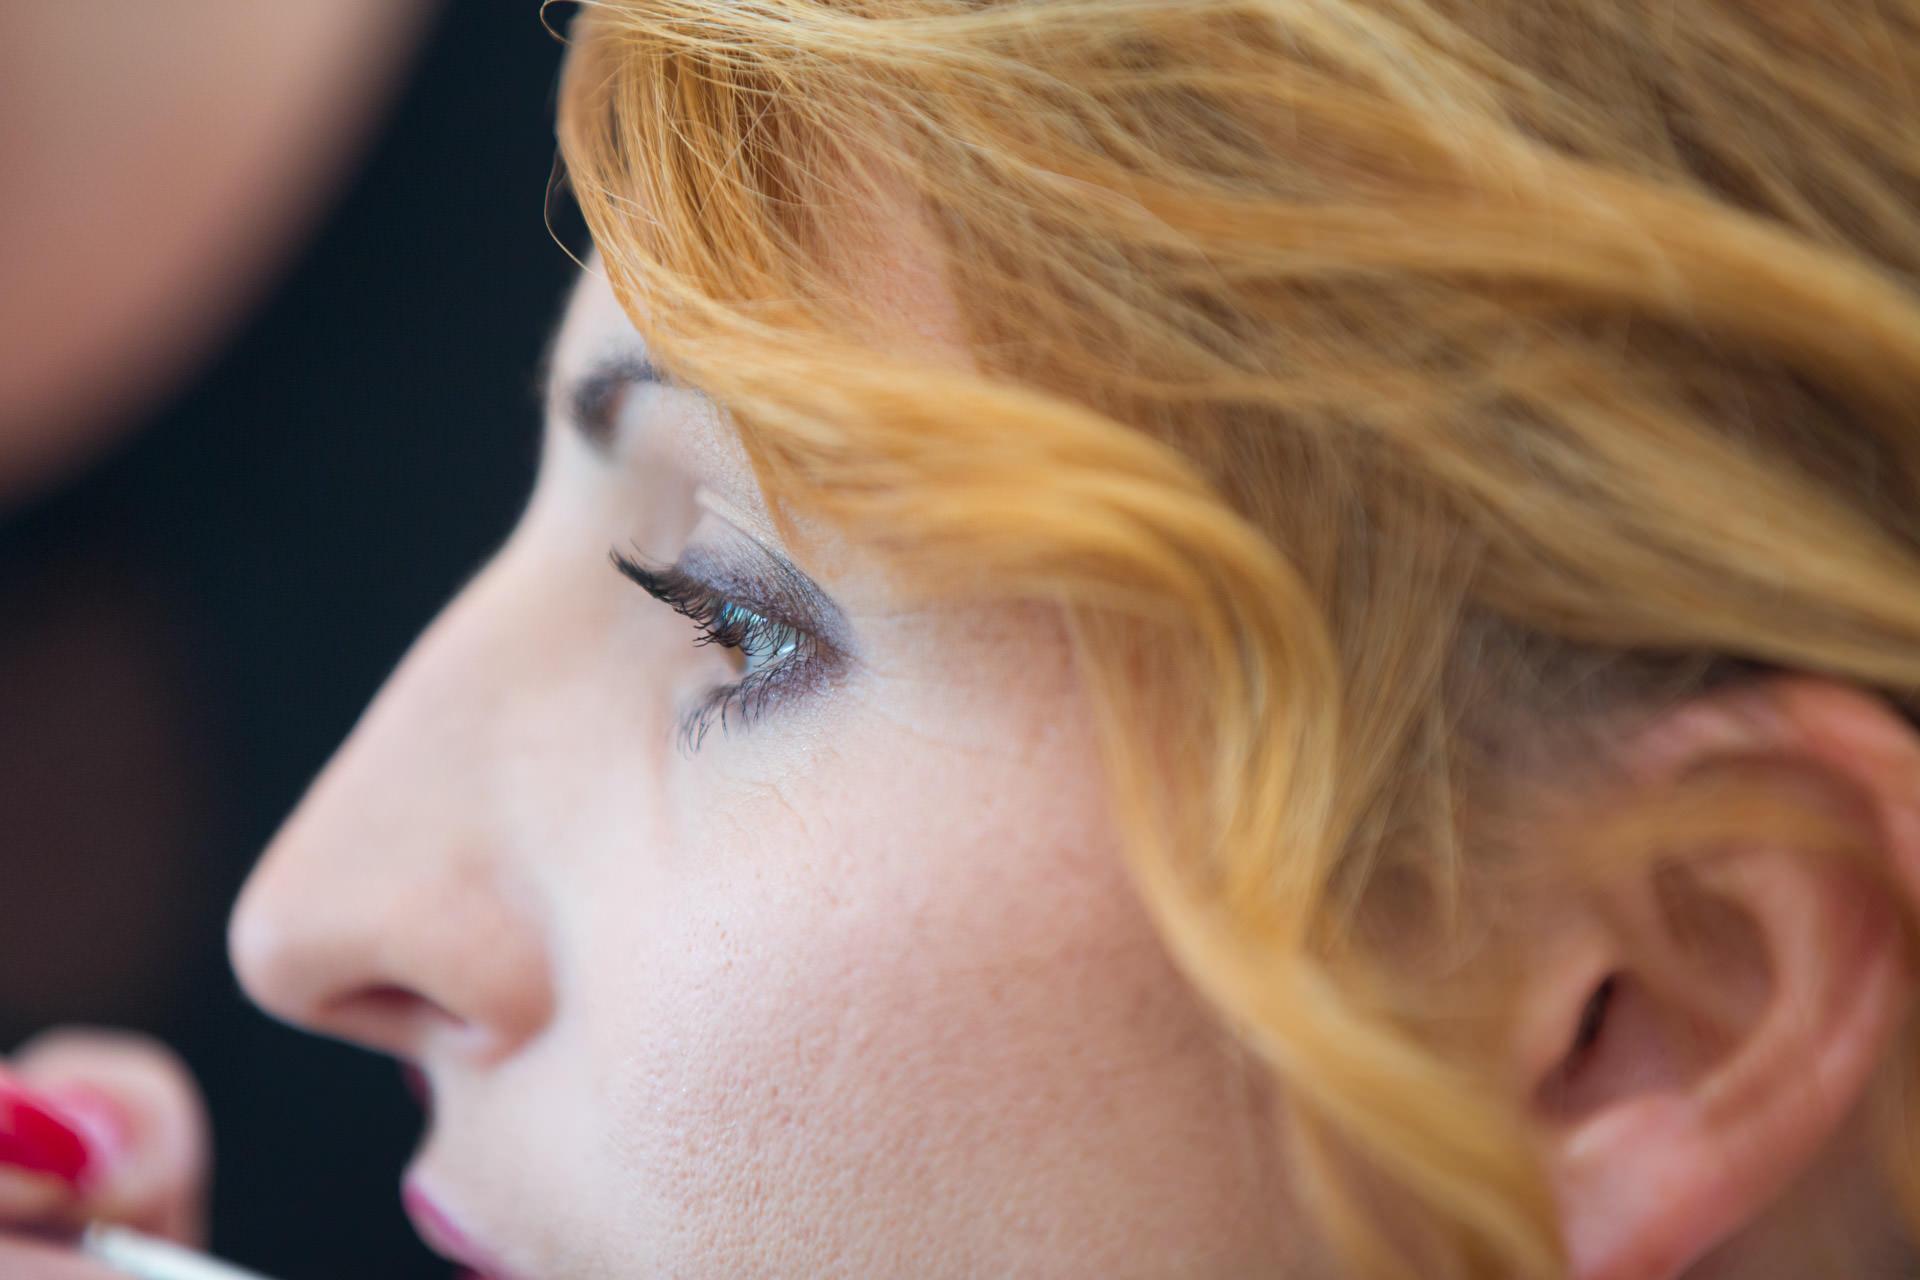 Photographe de Mariage Rock detail gros plan yeux